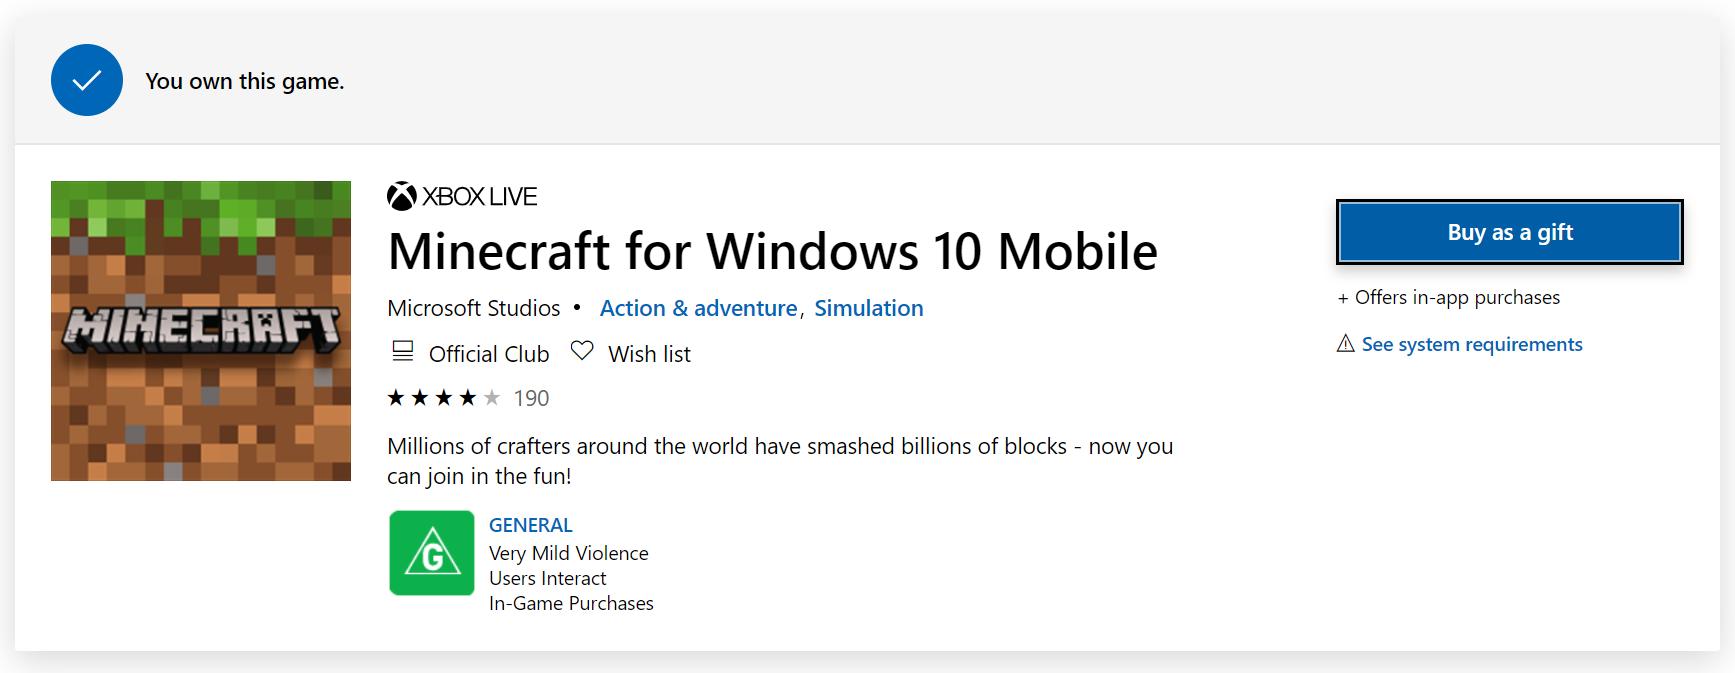 Minecraft downloading/purchasing [IMG]